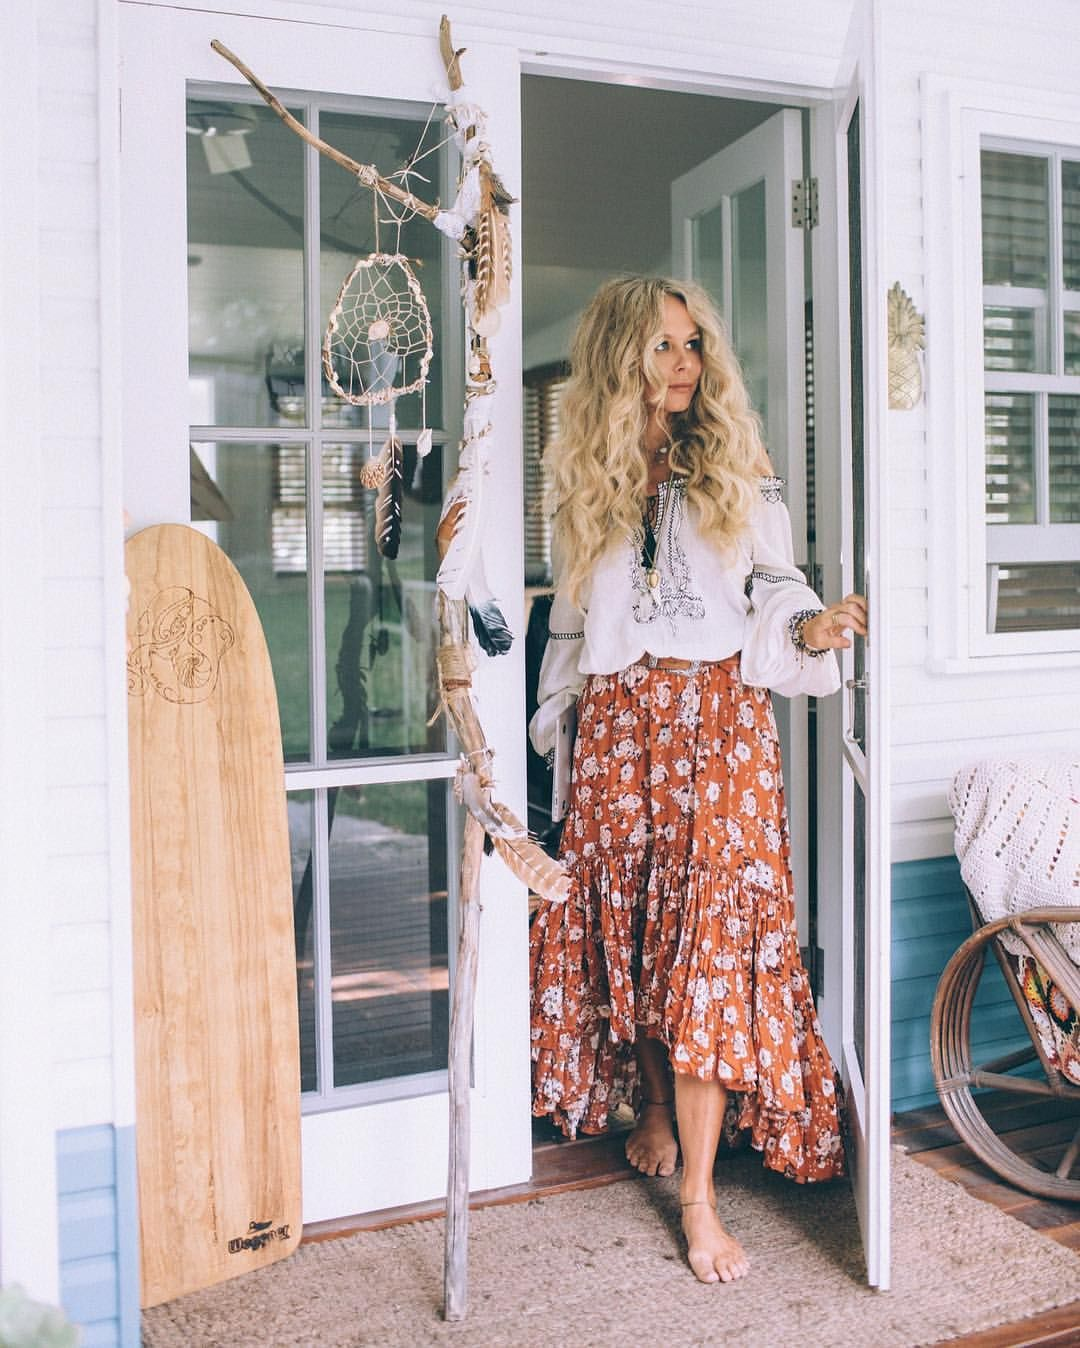 Bohémien folk: lo stile hippie torna in guardaroba Foto 7